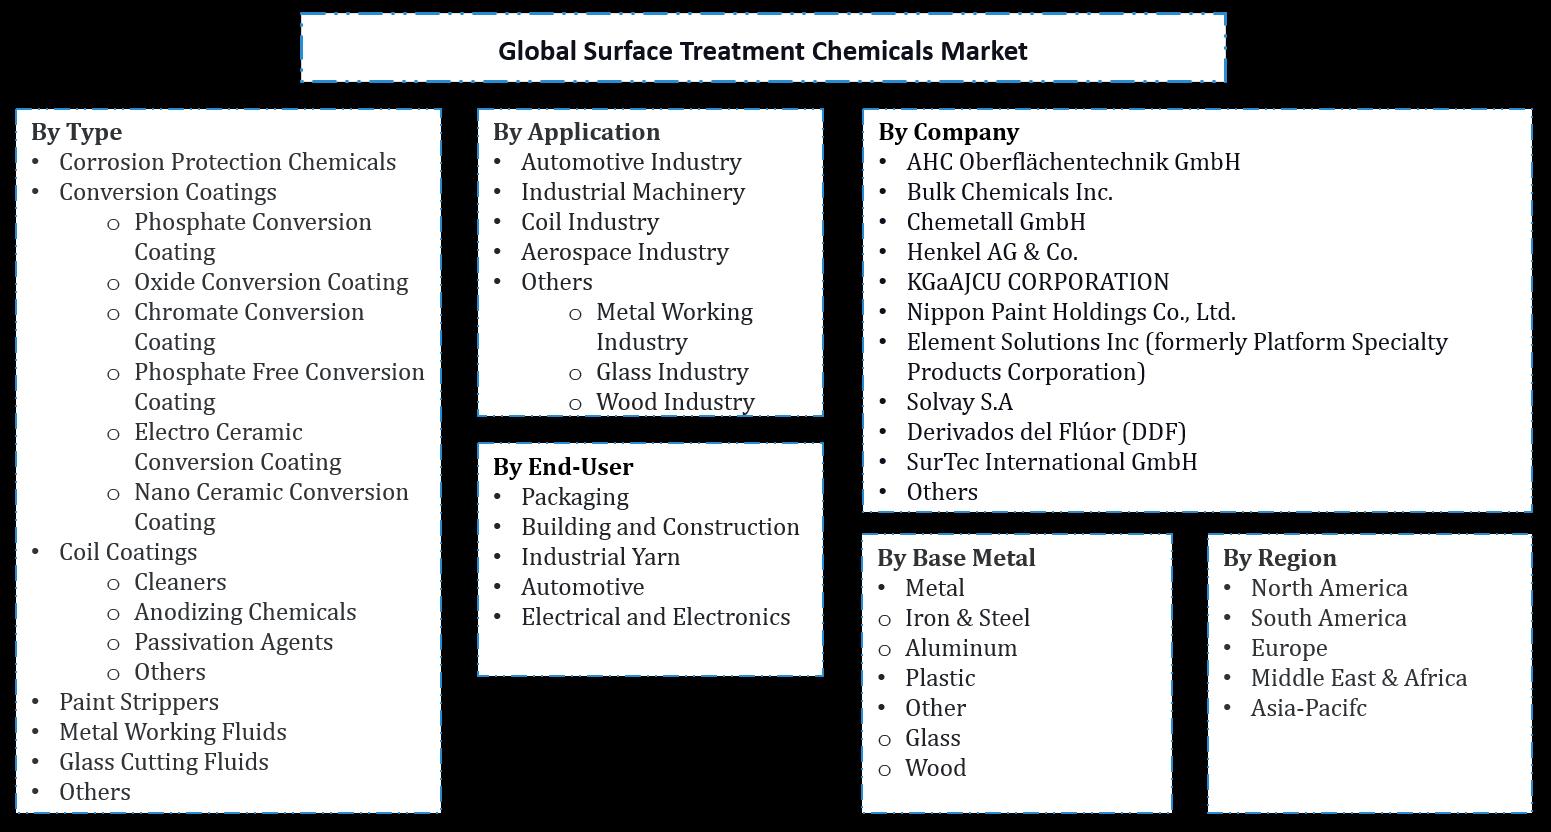 Global Surface Treatment Chemicals Market Segmentation